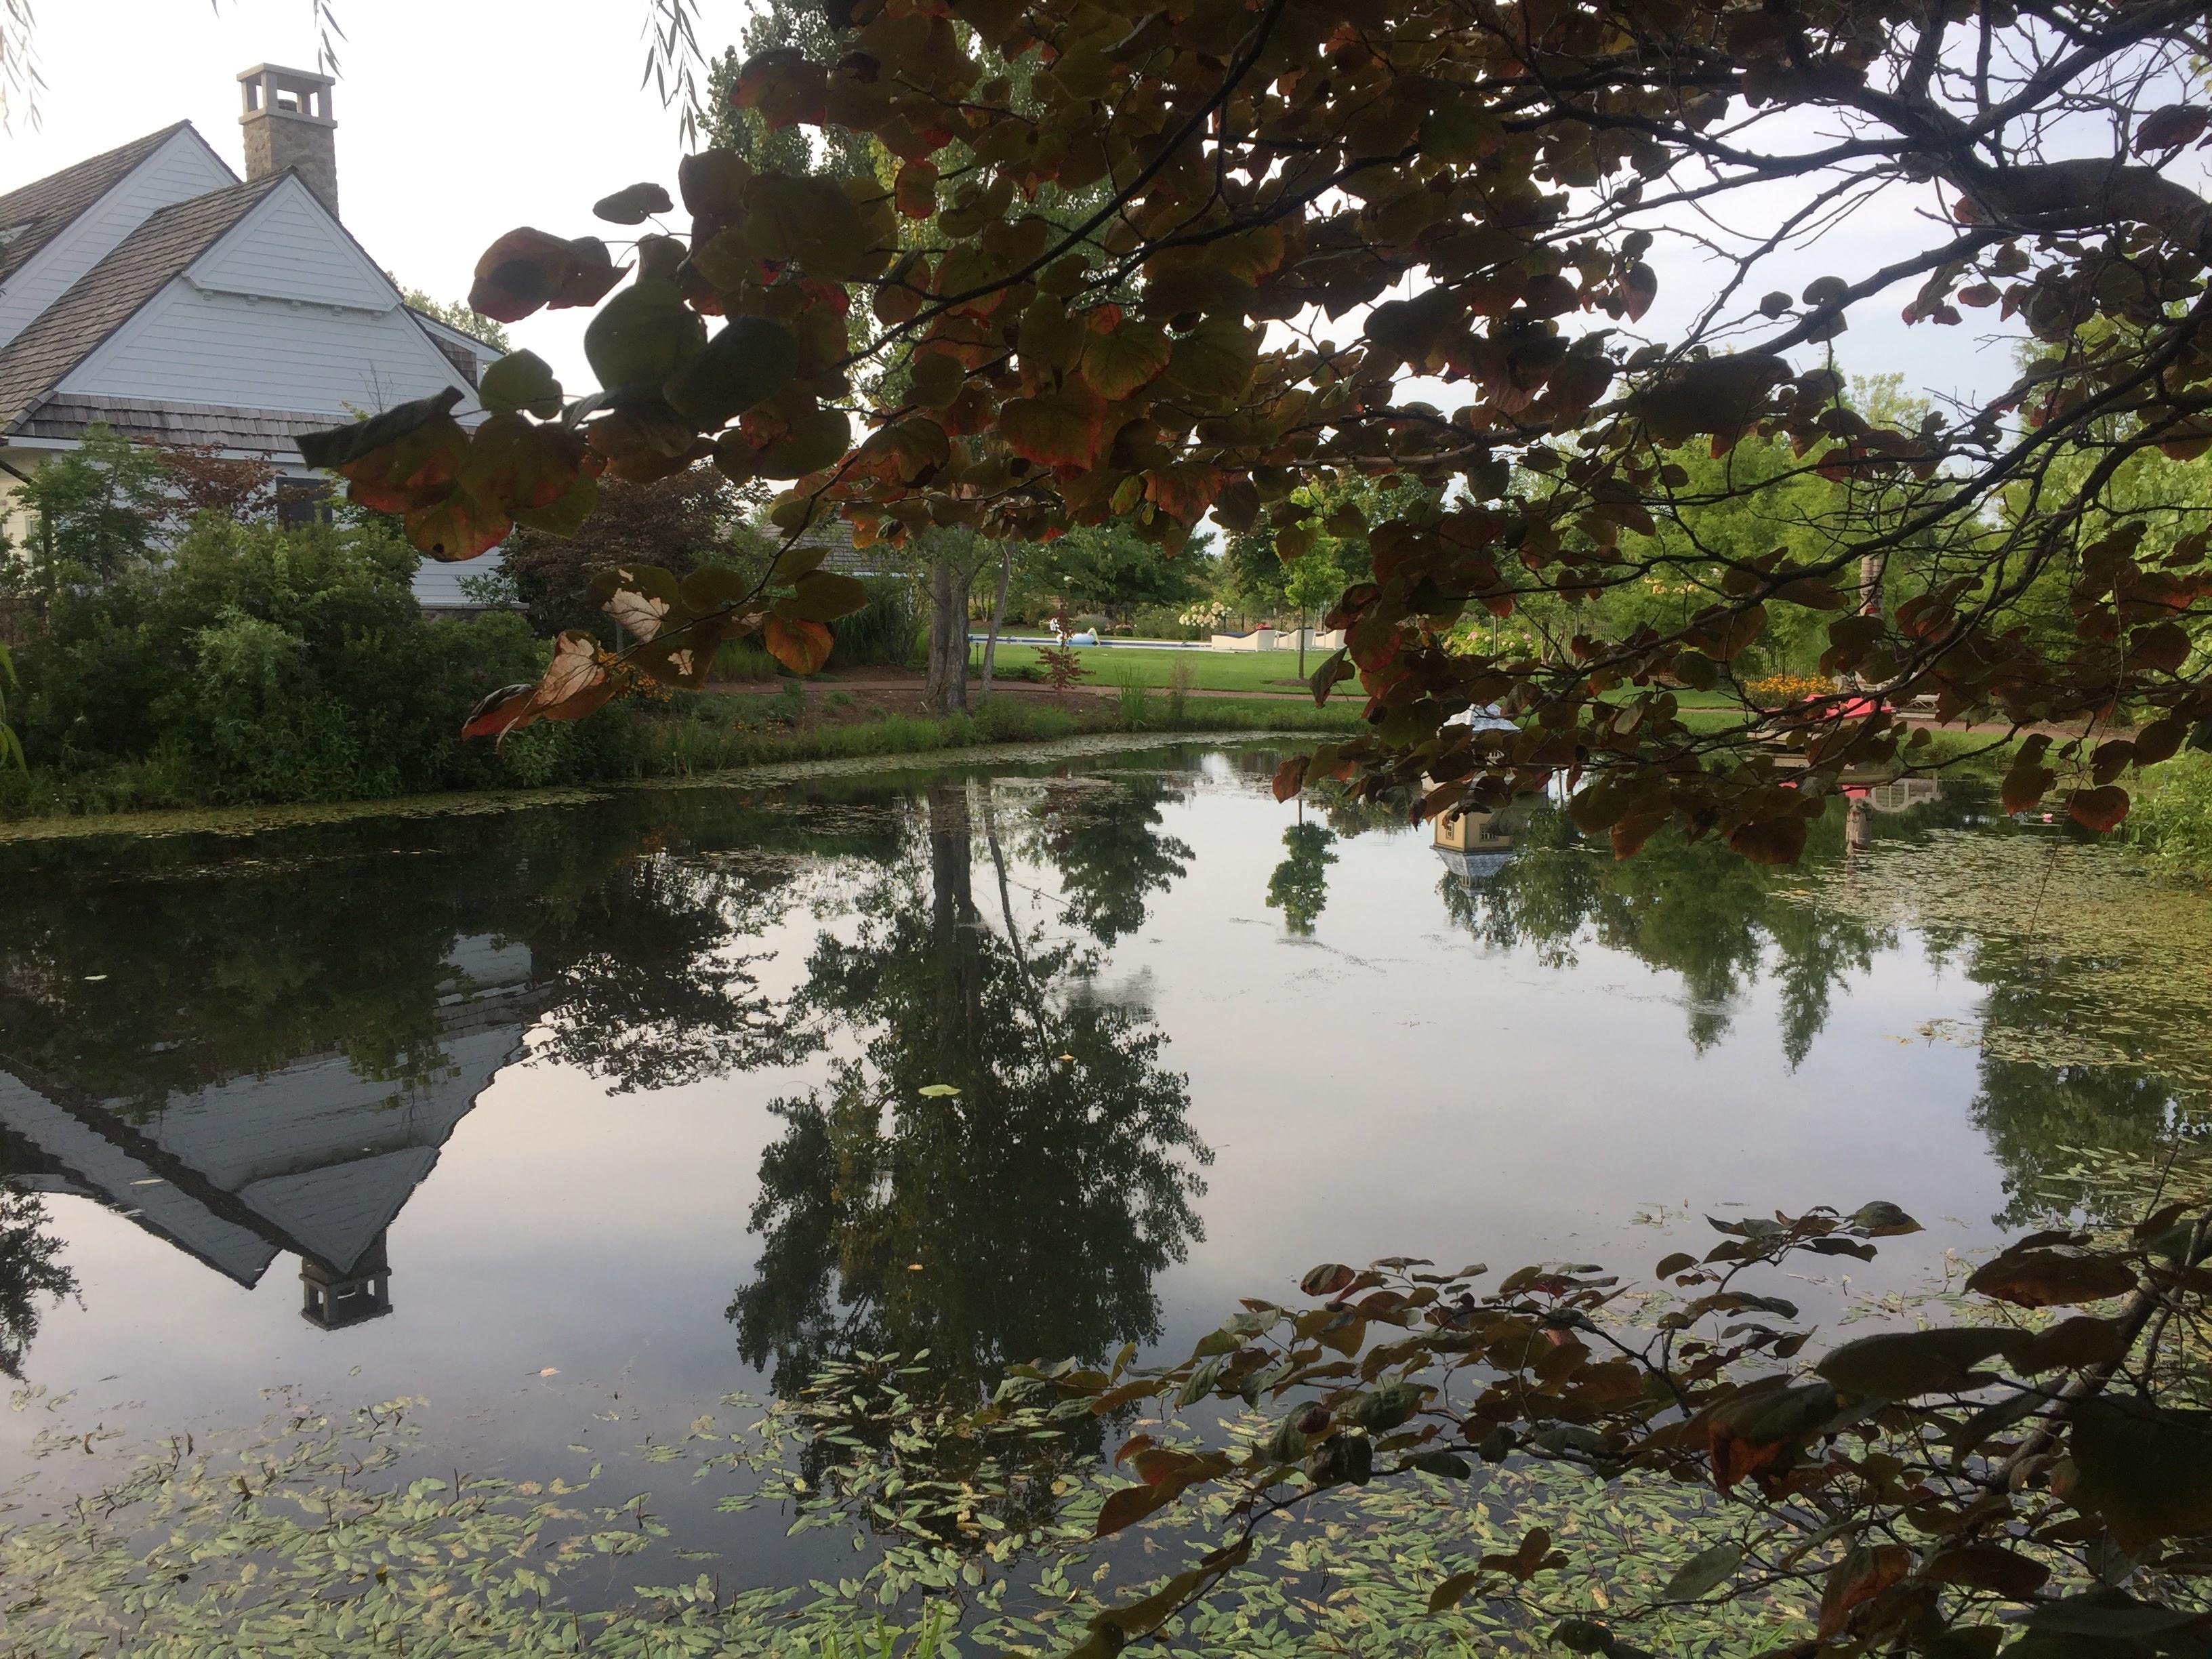 2017-08-26 McAnoy - Pond